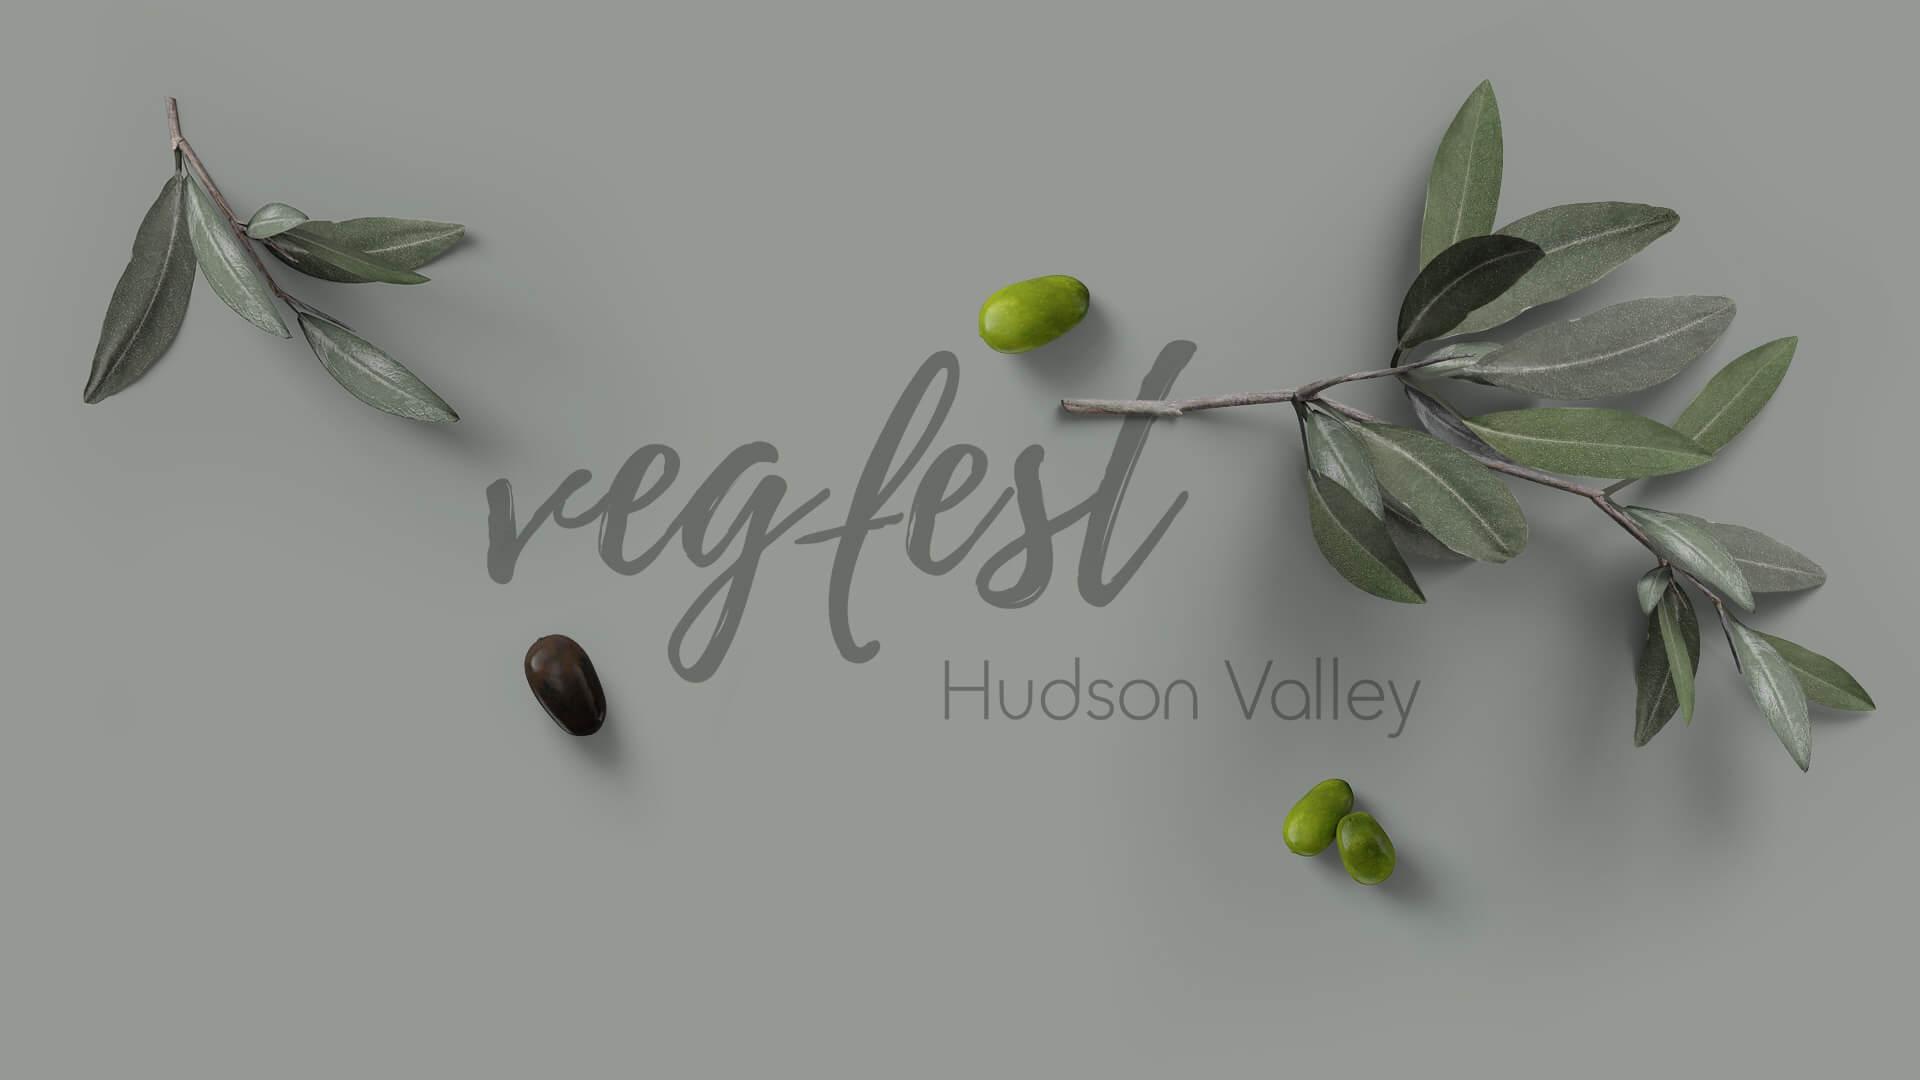 vegfest_1